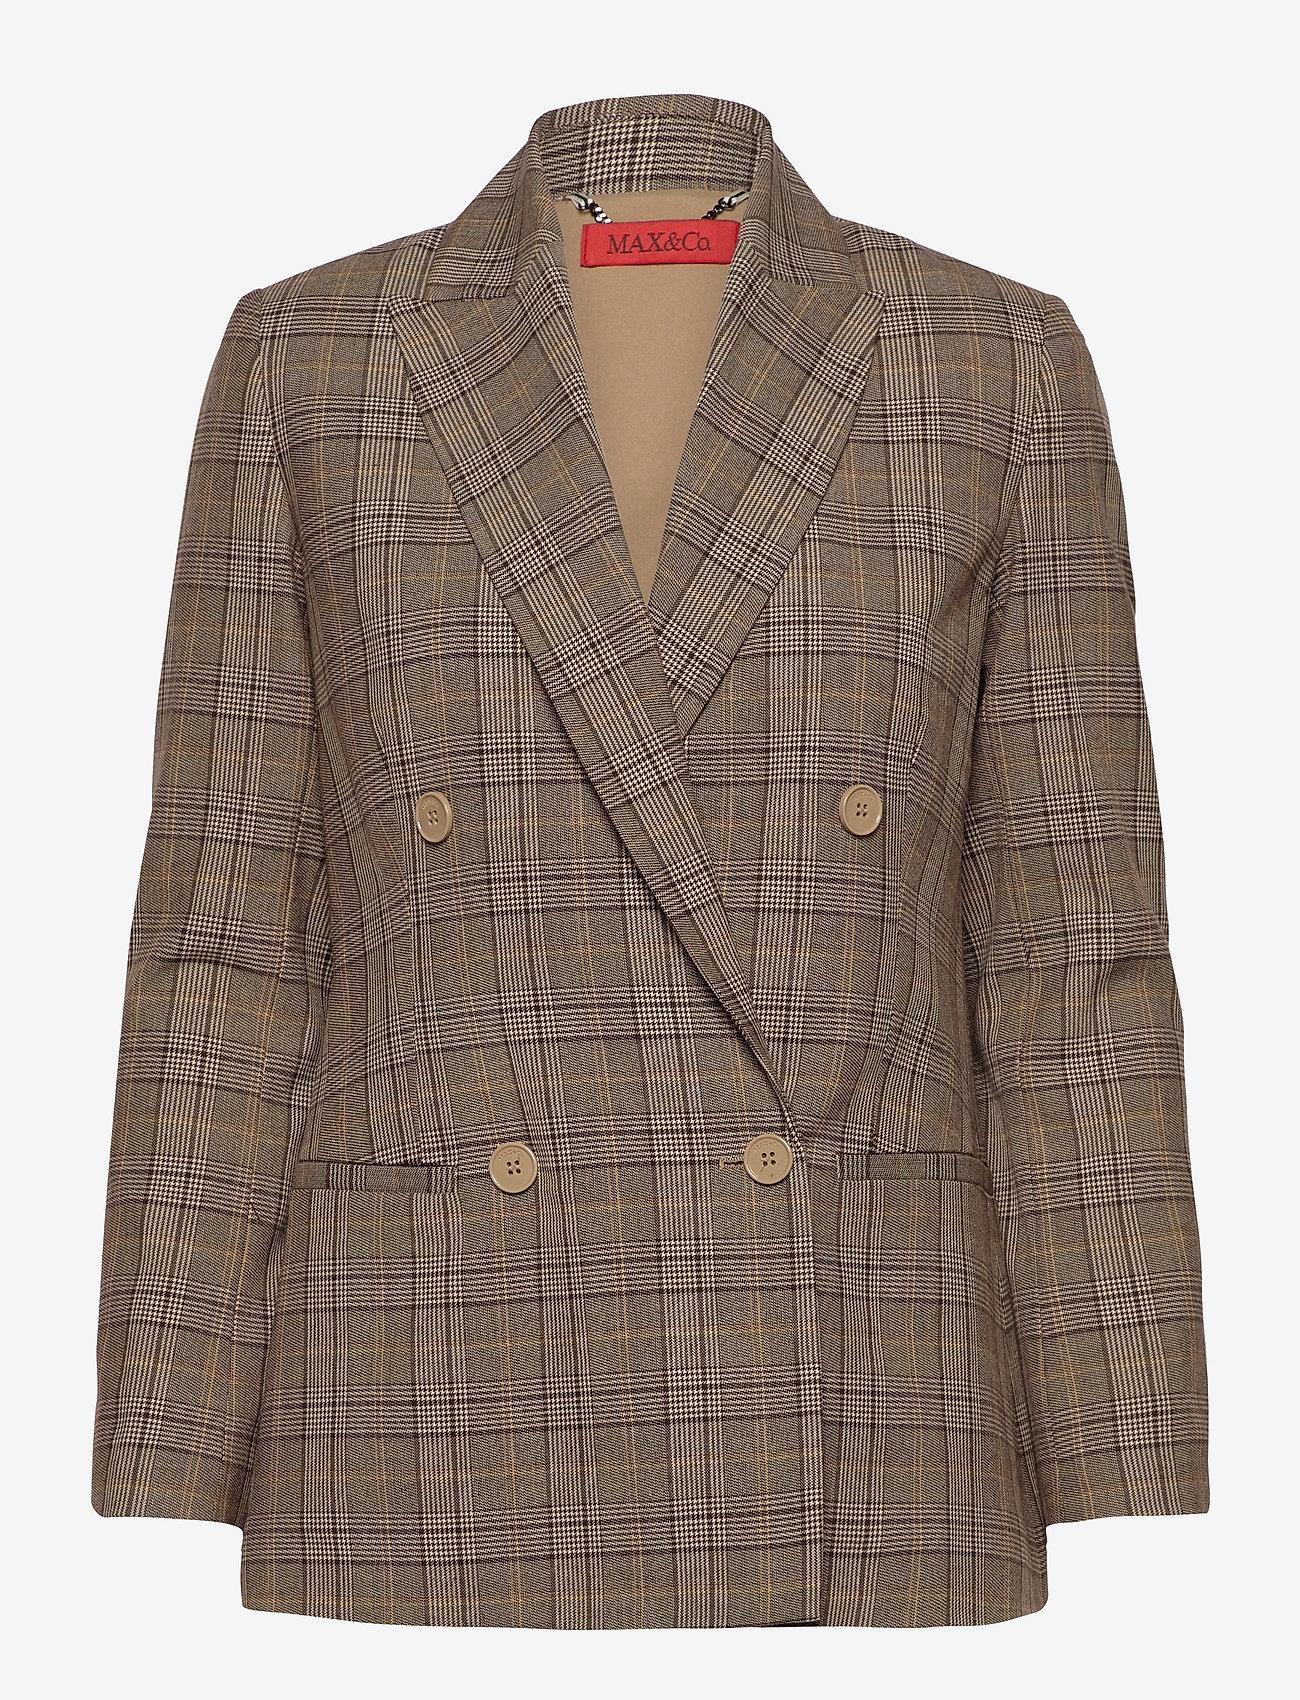 Max&Co. - CAGLIARI - oversized blazers - beige pattern - 0